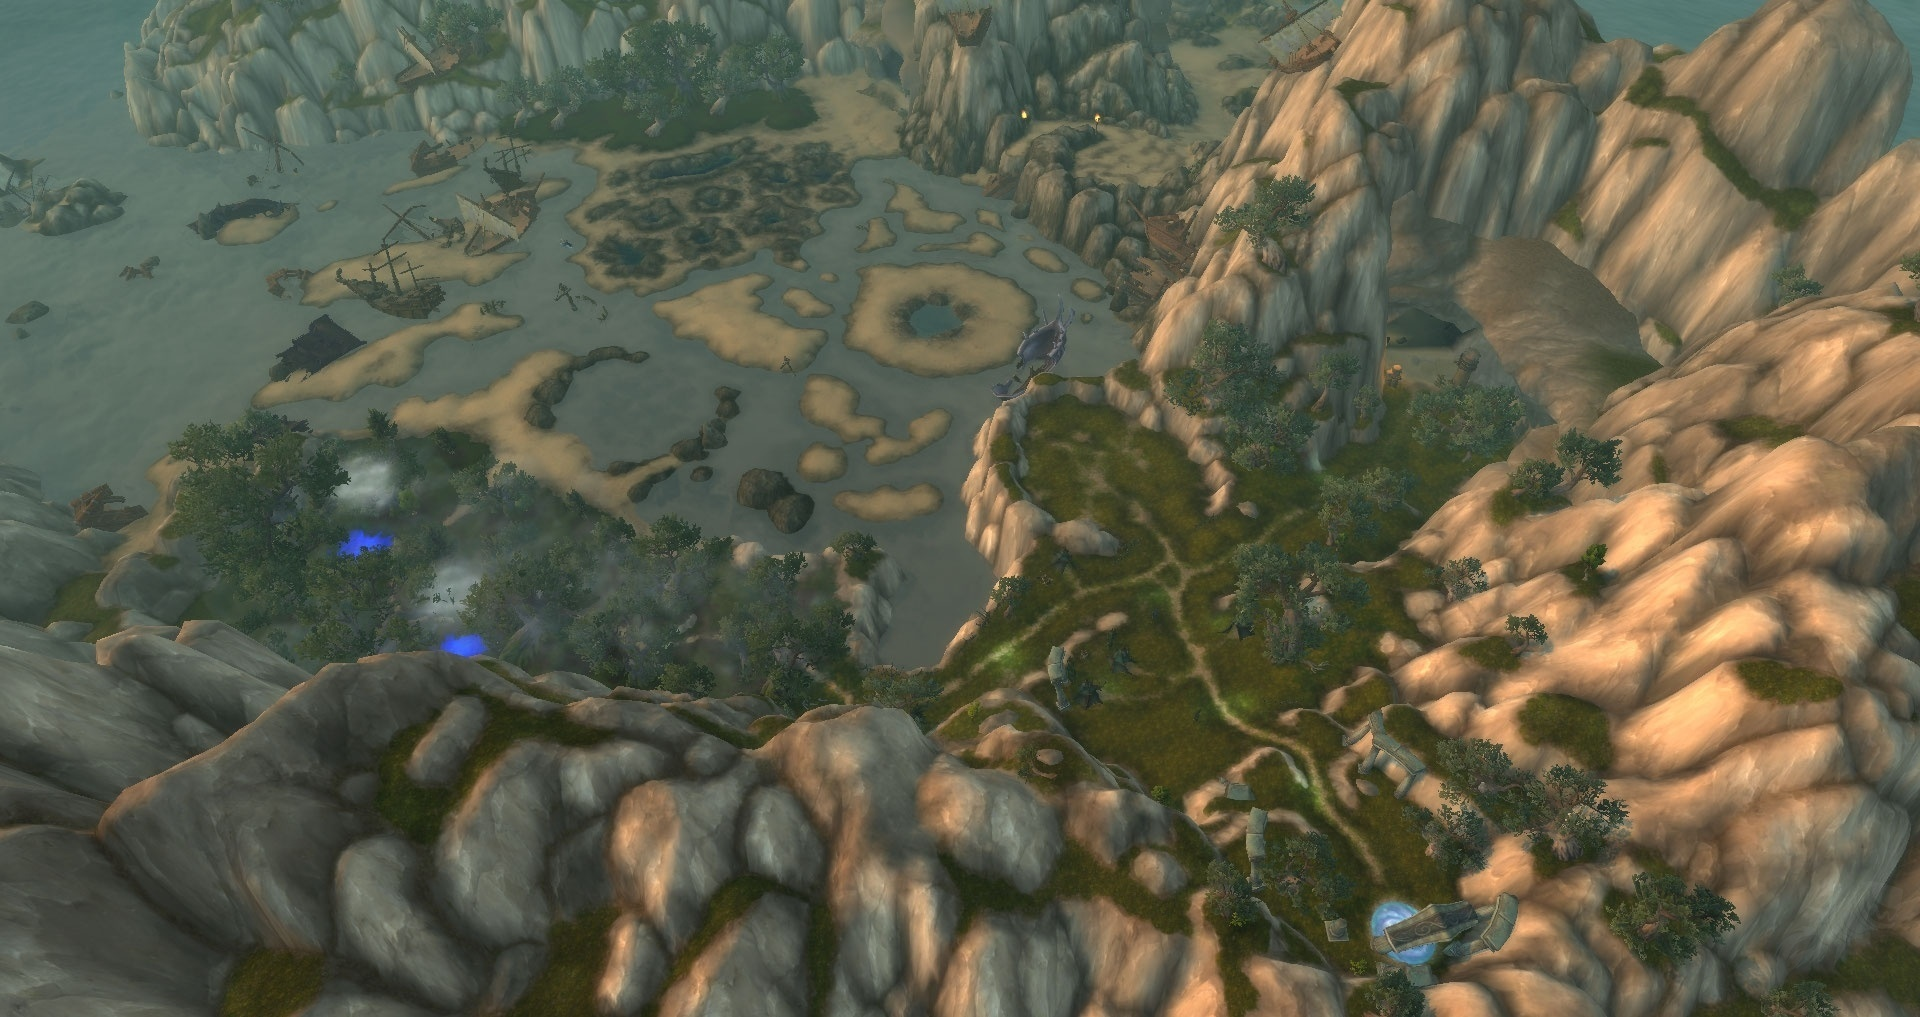 Mythic+ Highlights: Naowh's Blood DK Guide, Eye of Azshara Skip